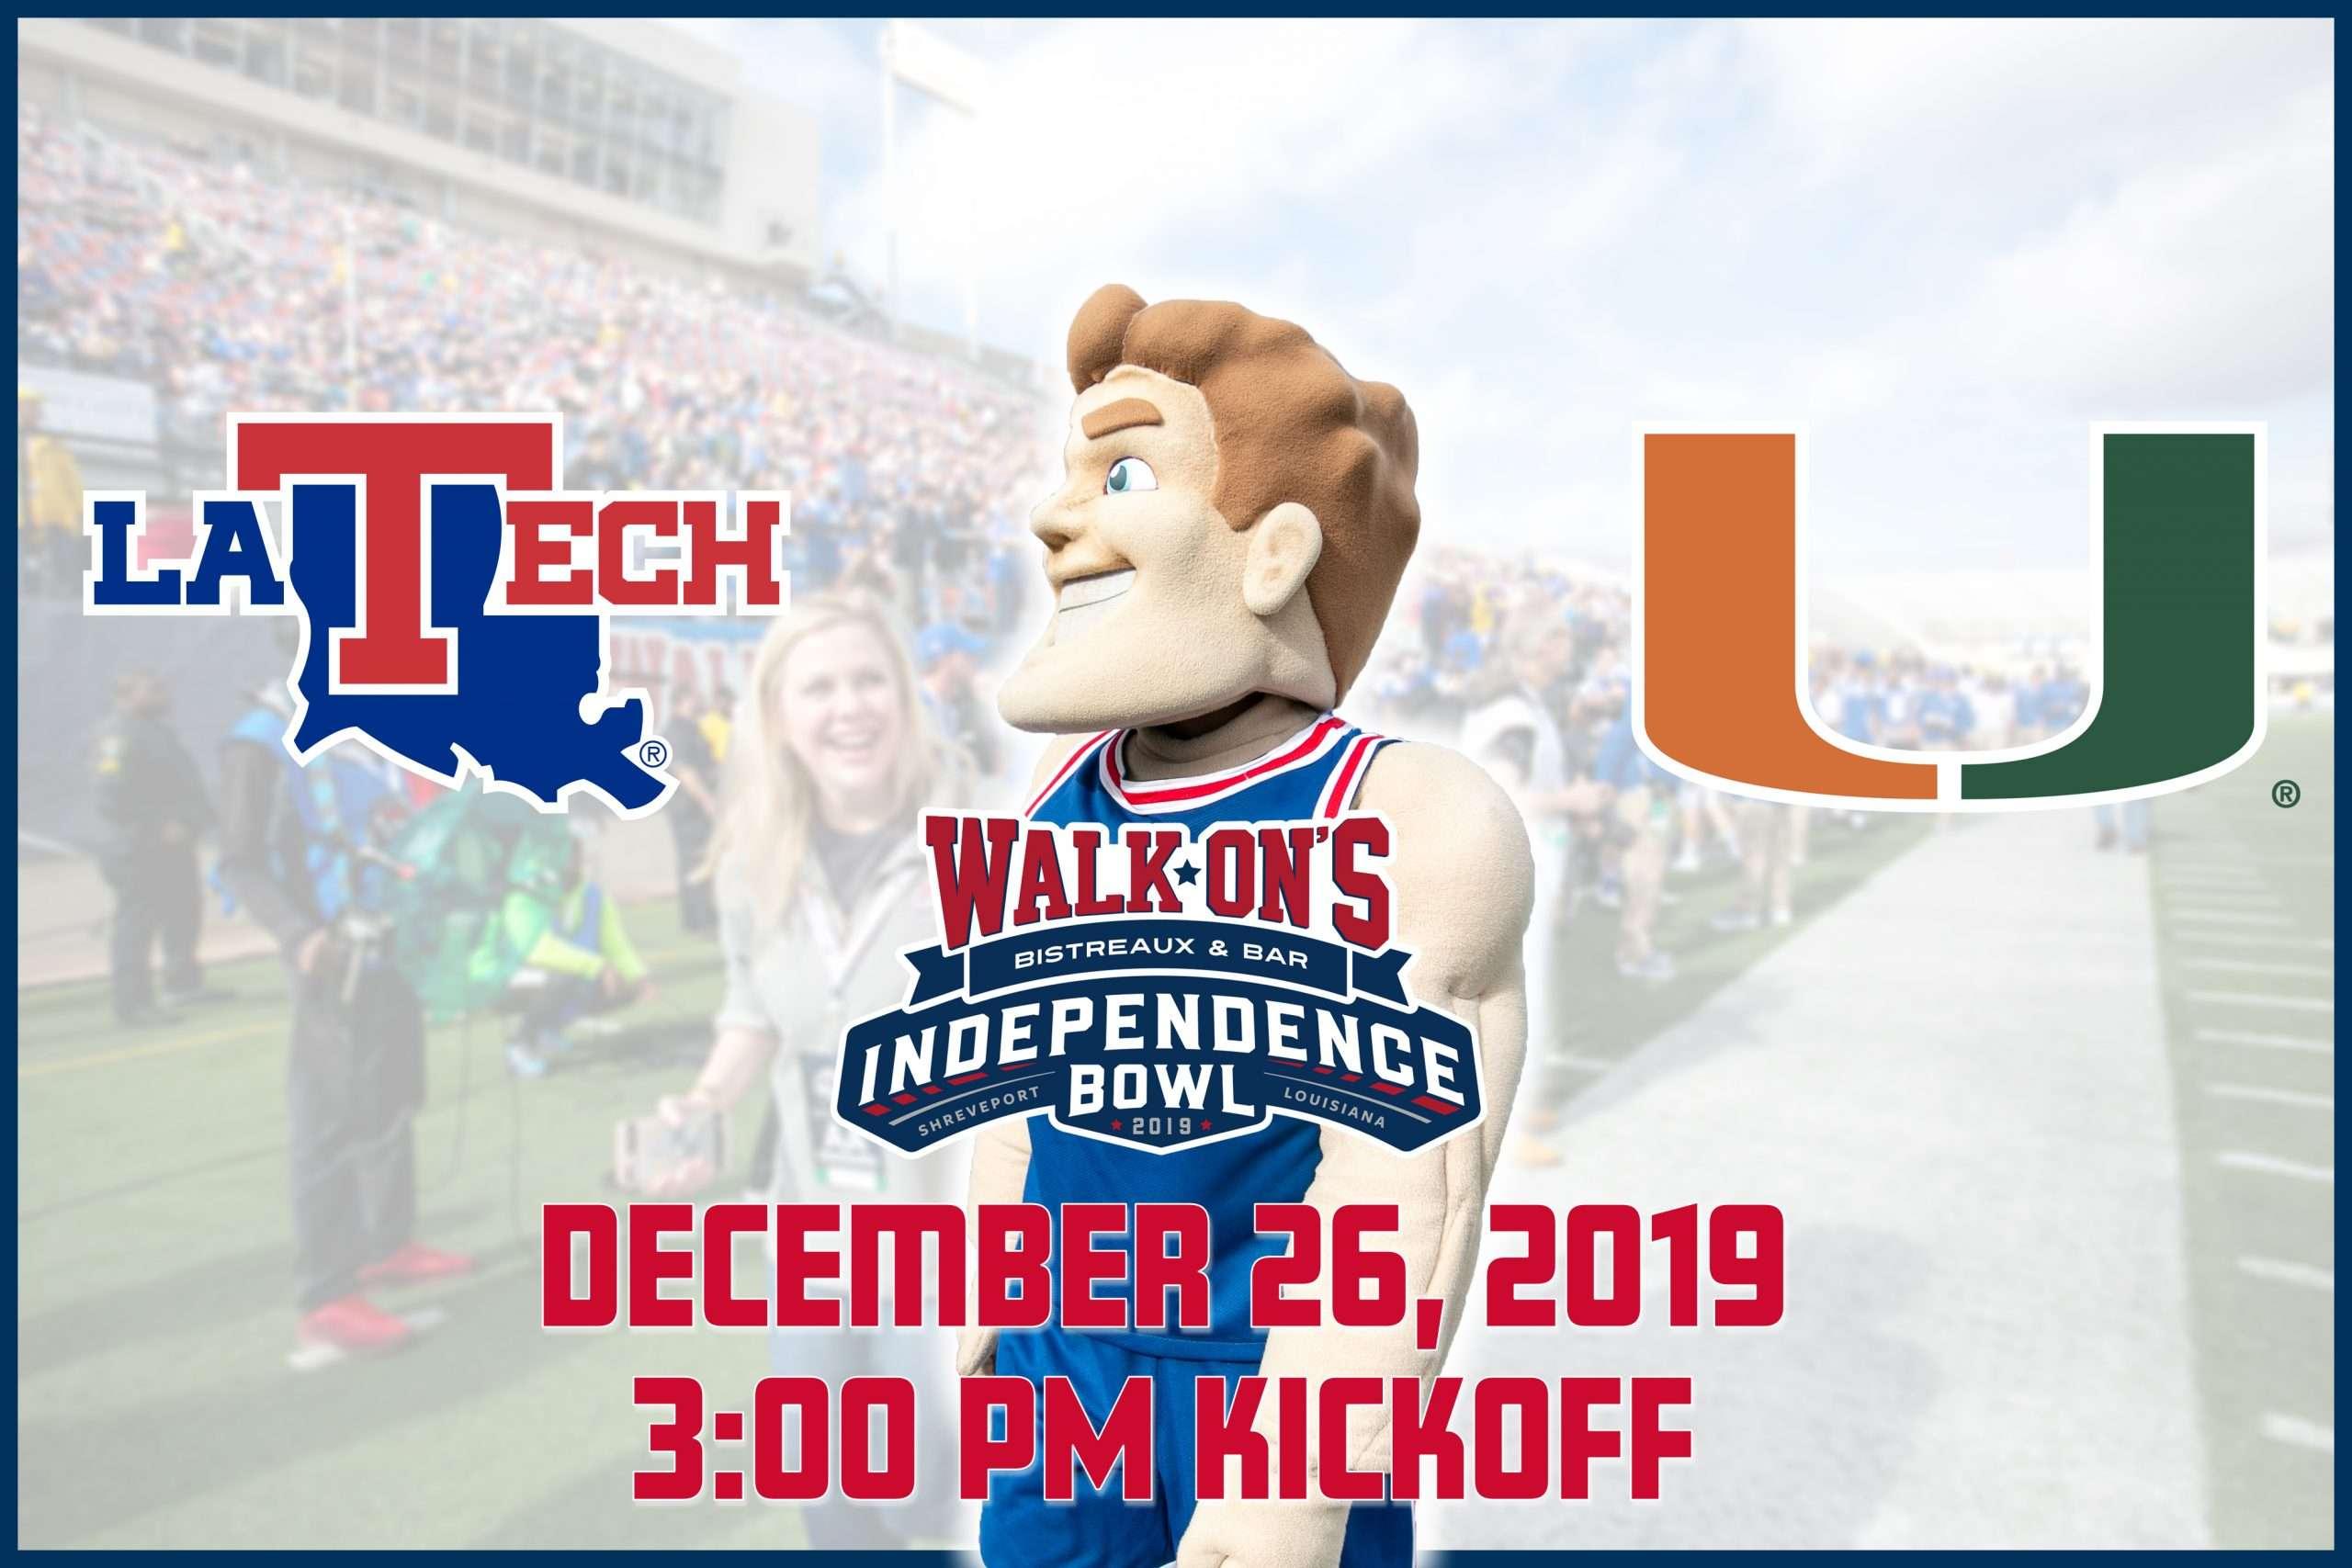 LA Tech vs. Miami - Independence Bowl